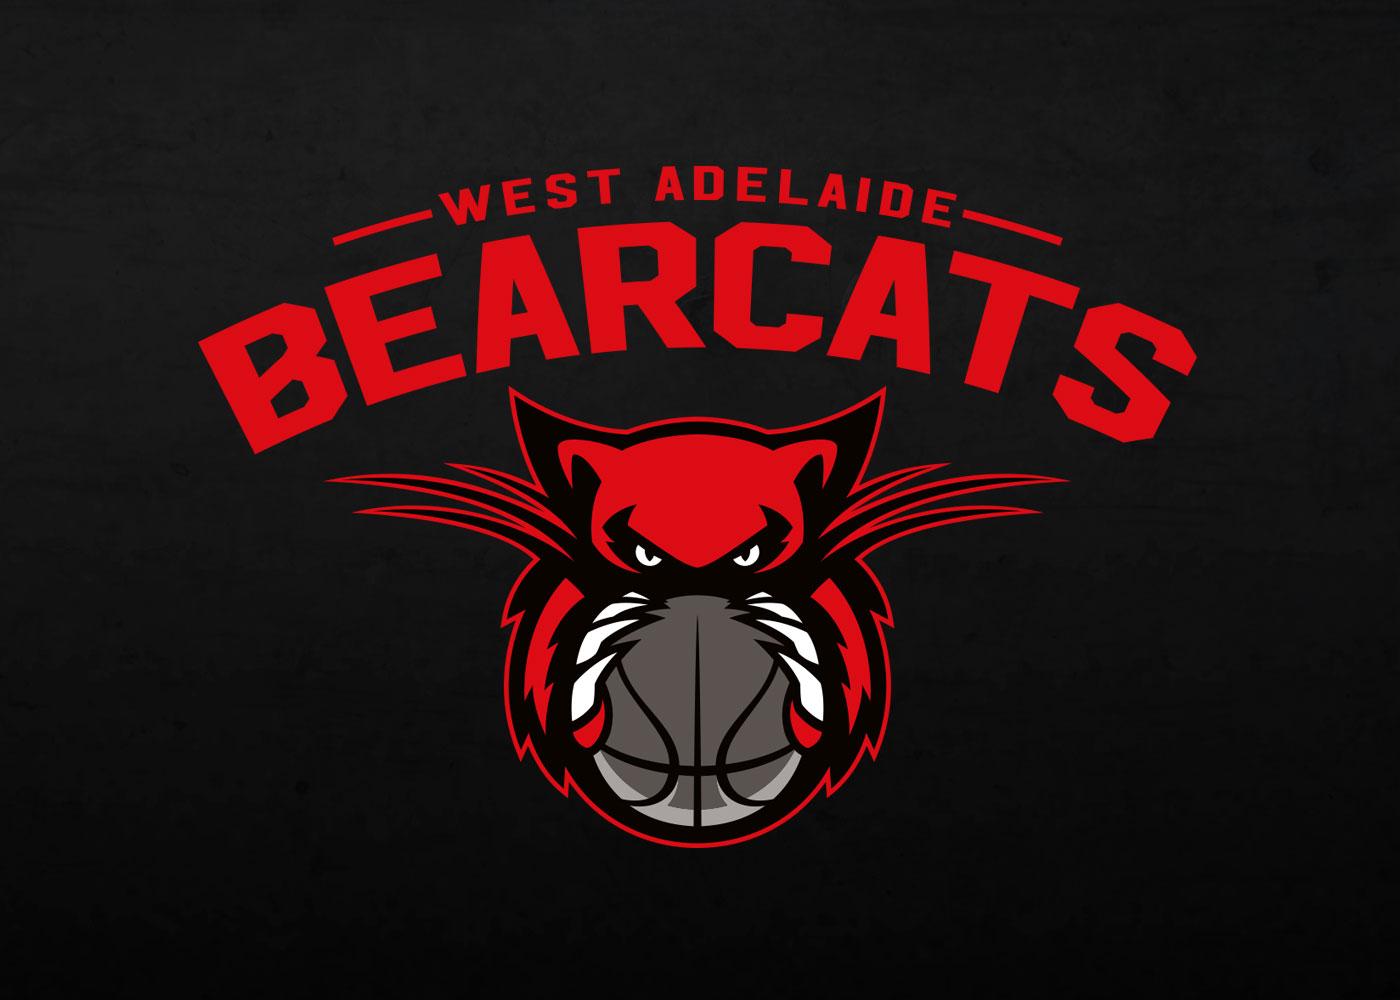 West Adelaide Bearcats - reverse logo